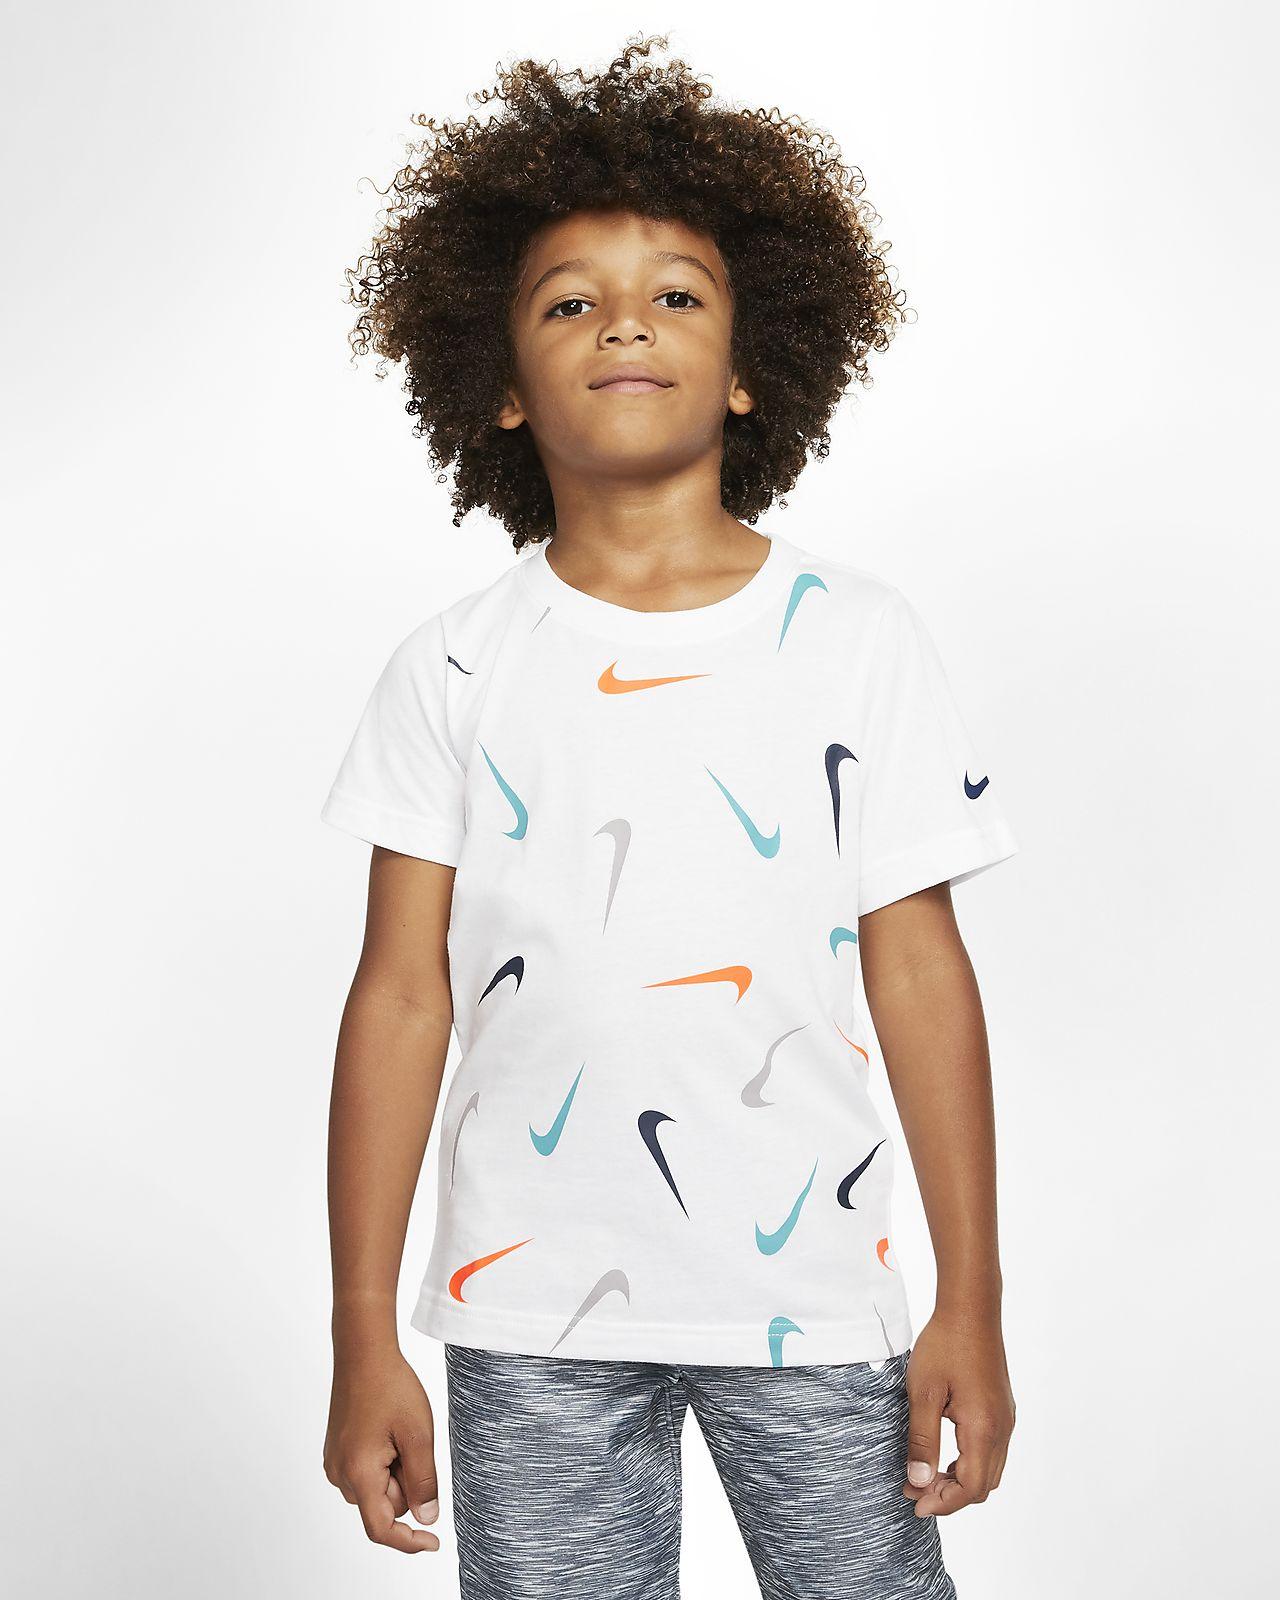 Nike T-Shirt für jüngere Kinder